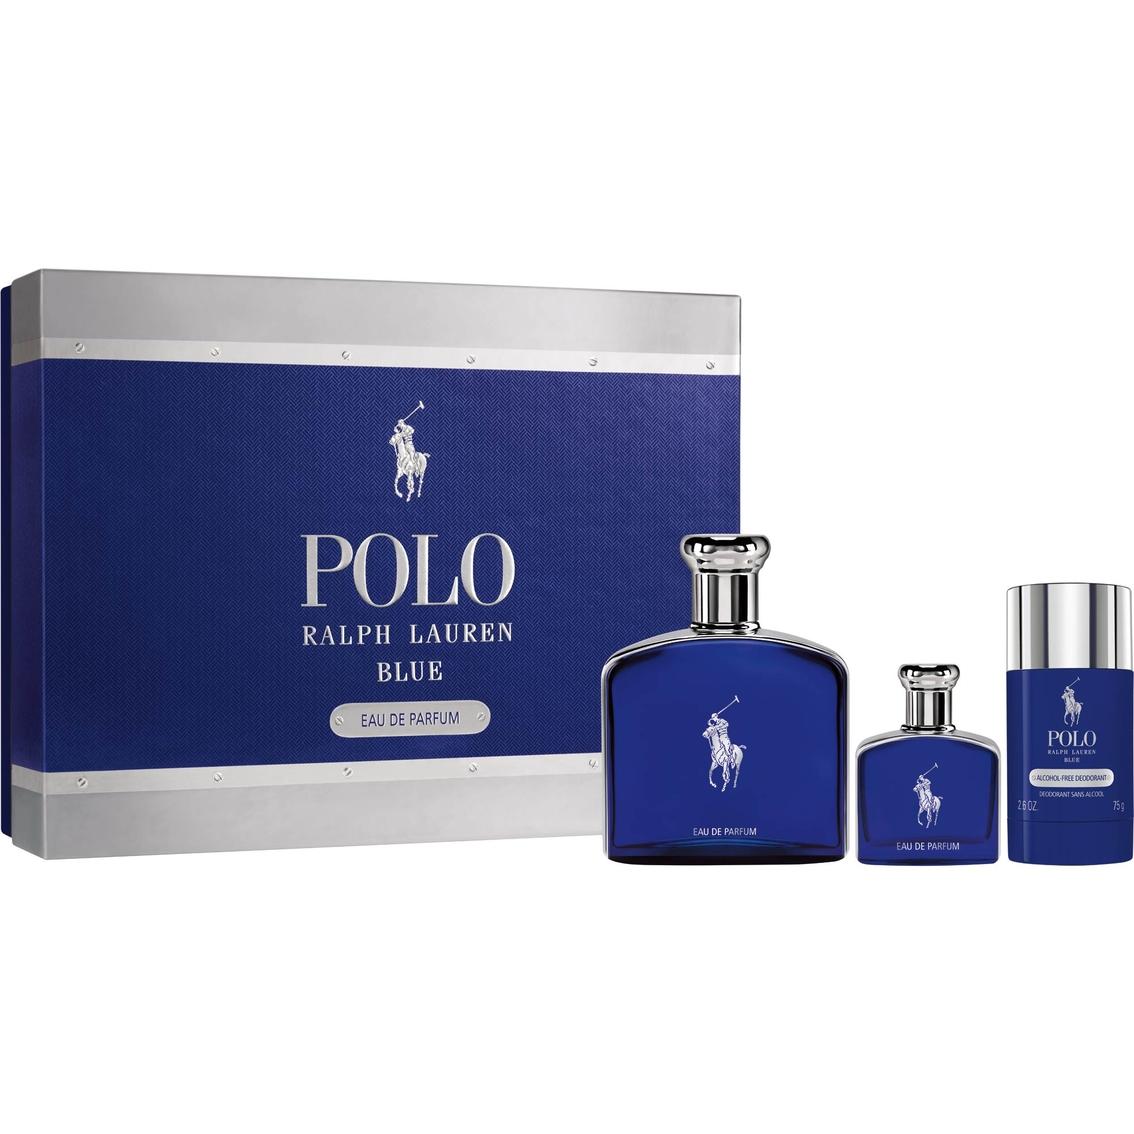 Ralph Lauren Polo Blue Edp 3 Pc. Gift Set  6f4313ed29406